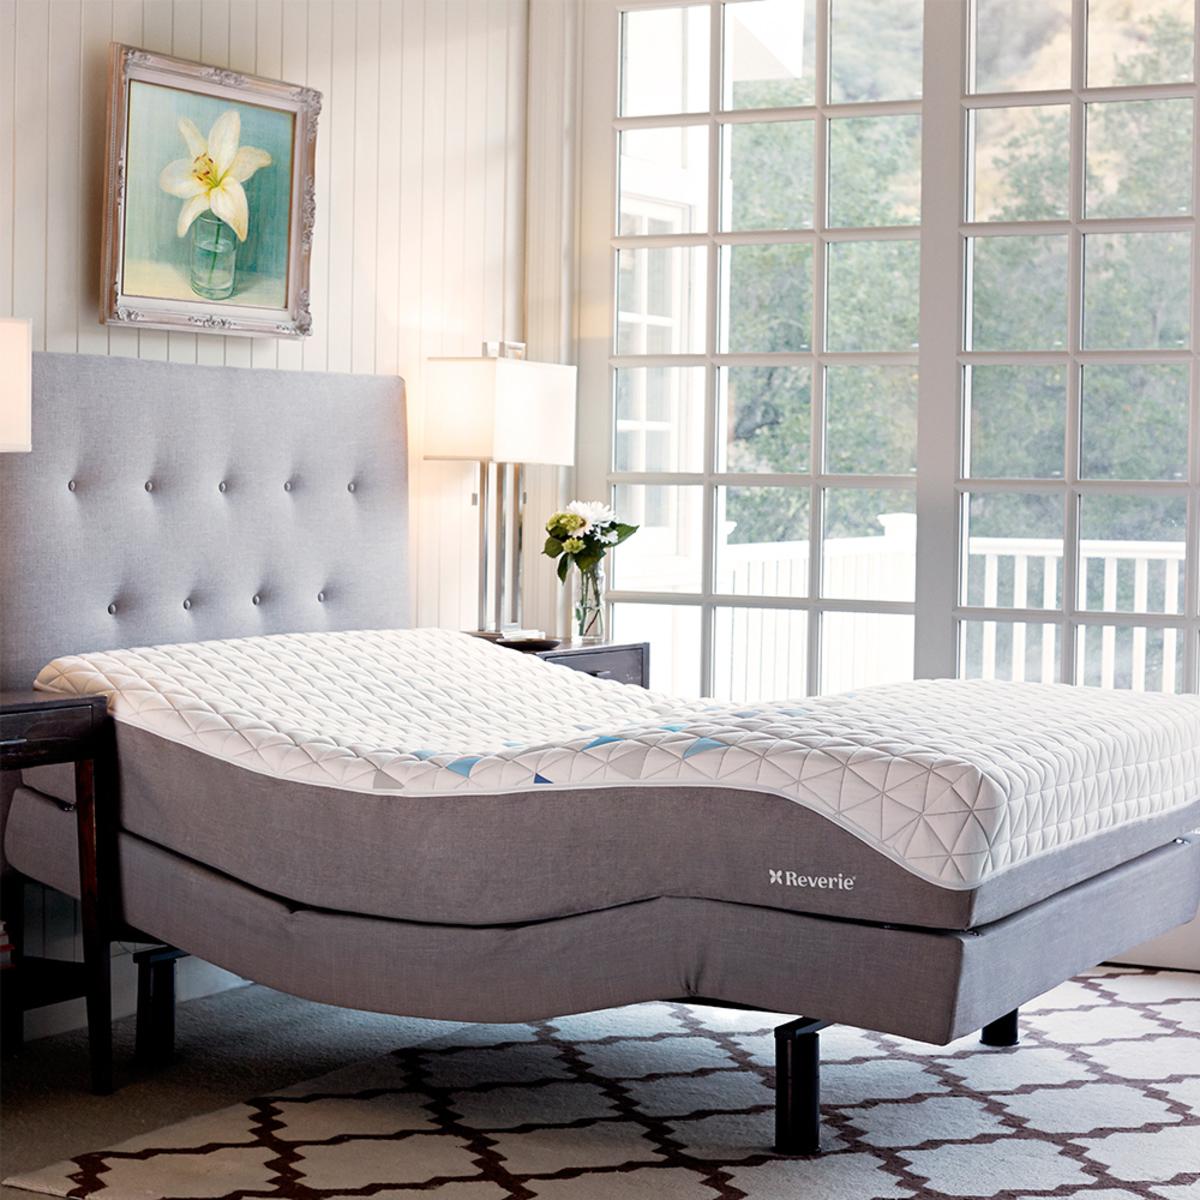 Reverie 標準雙人5D科技睡眠床墊